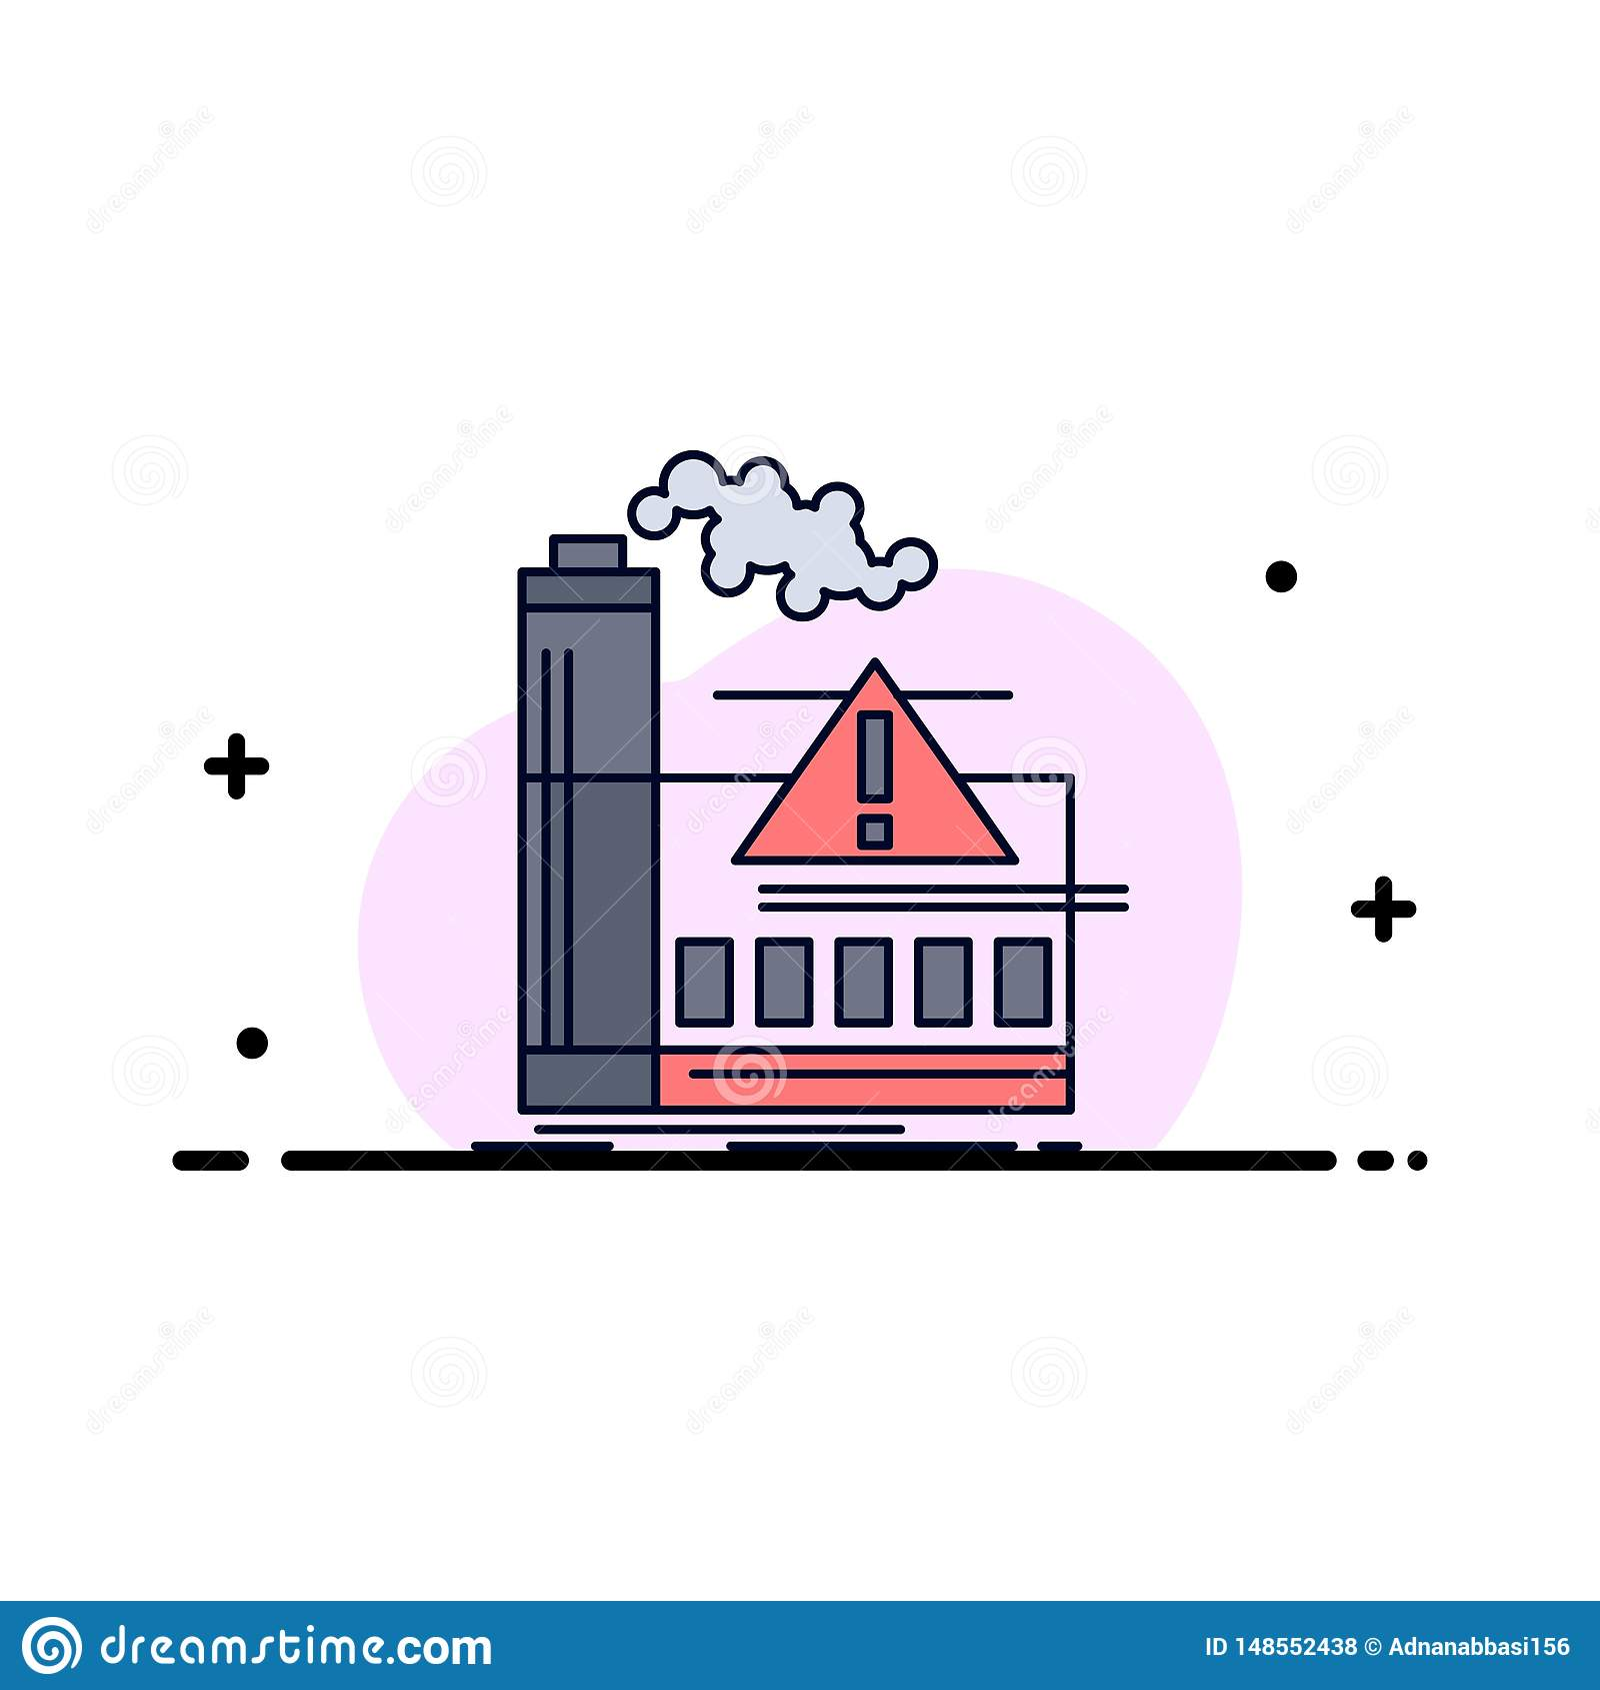 Verschmutzung, Fabrik, Luft, Alarm, Industrie flacher Farbikonen-Vektor